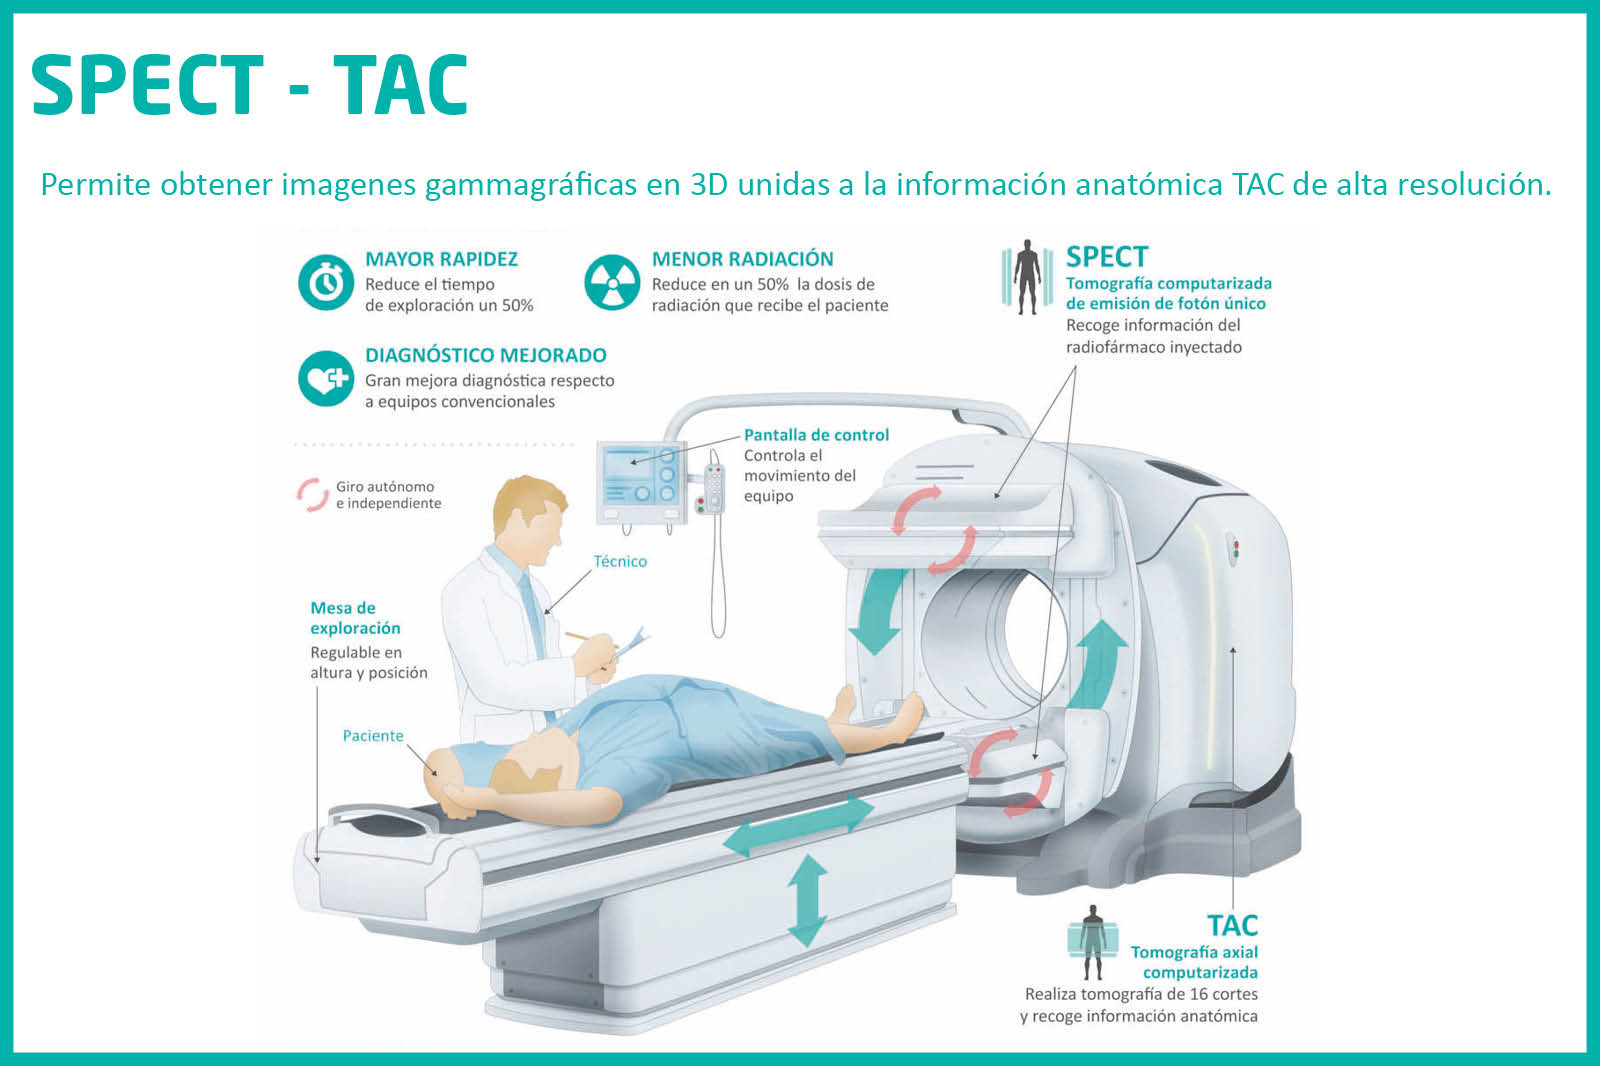 Medicina-Nuclear-SPECT-TAC-Clínica-Rotger-Hospital-Mallorca